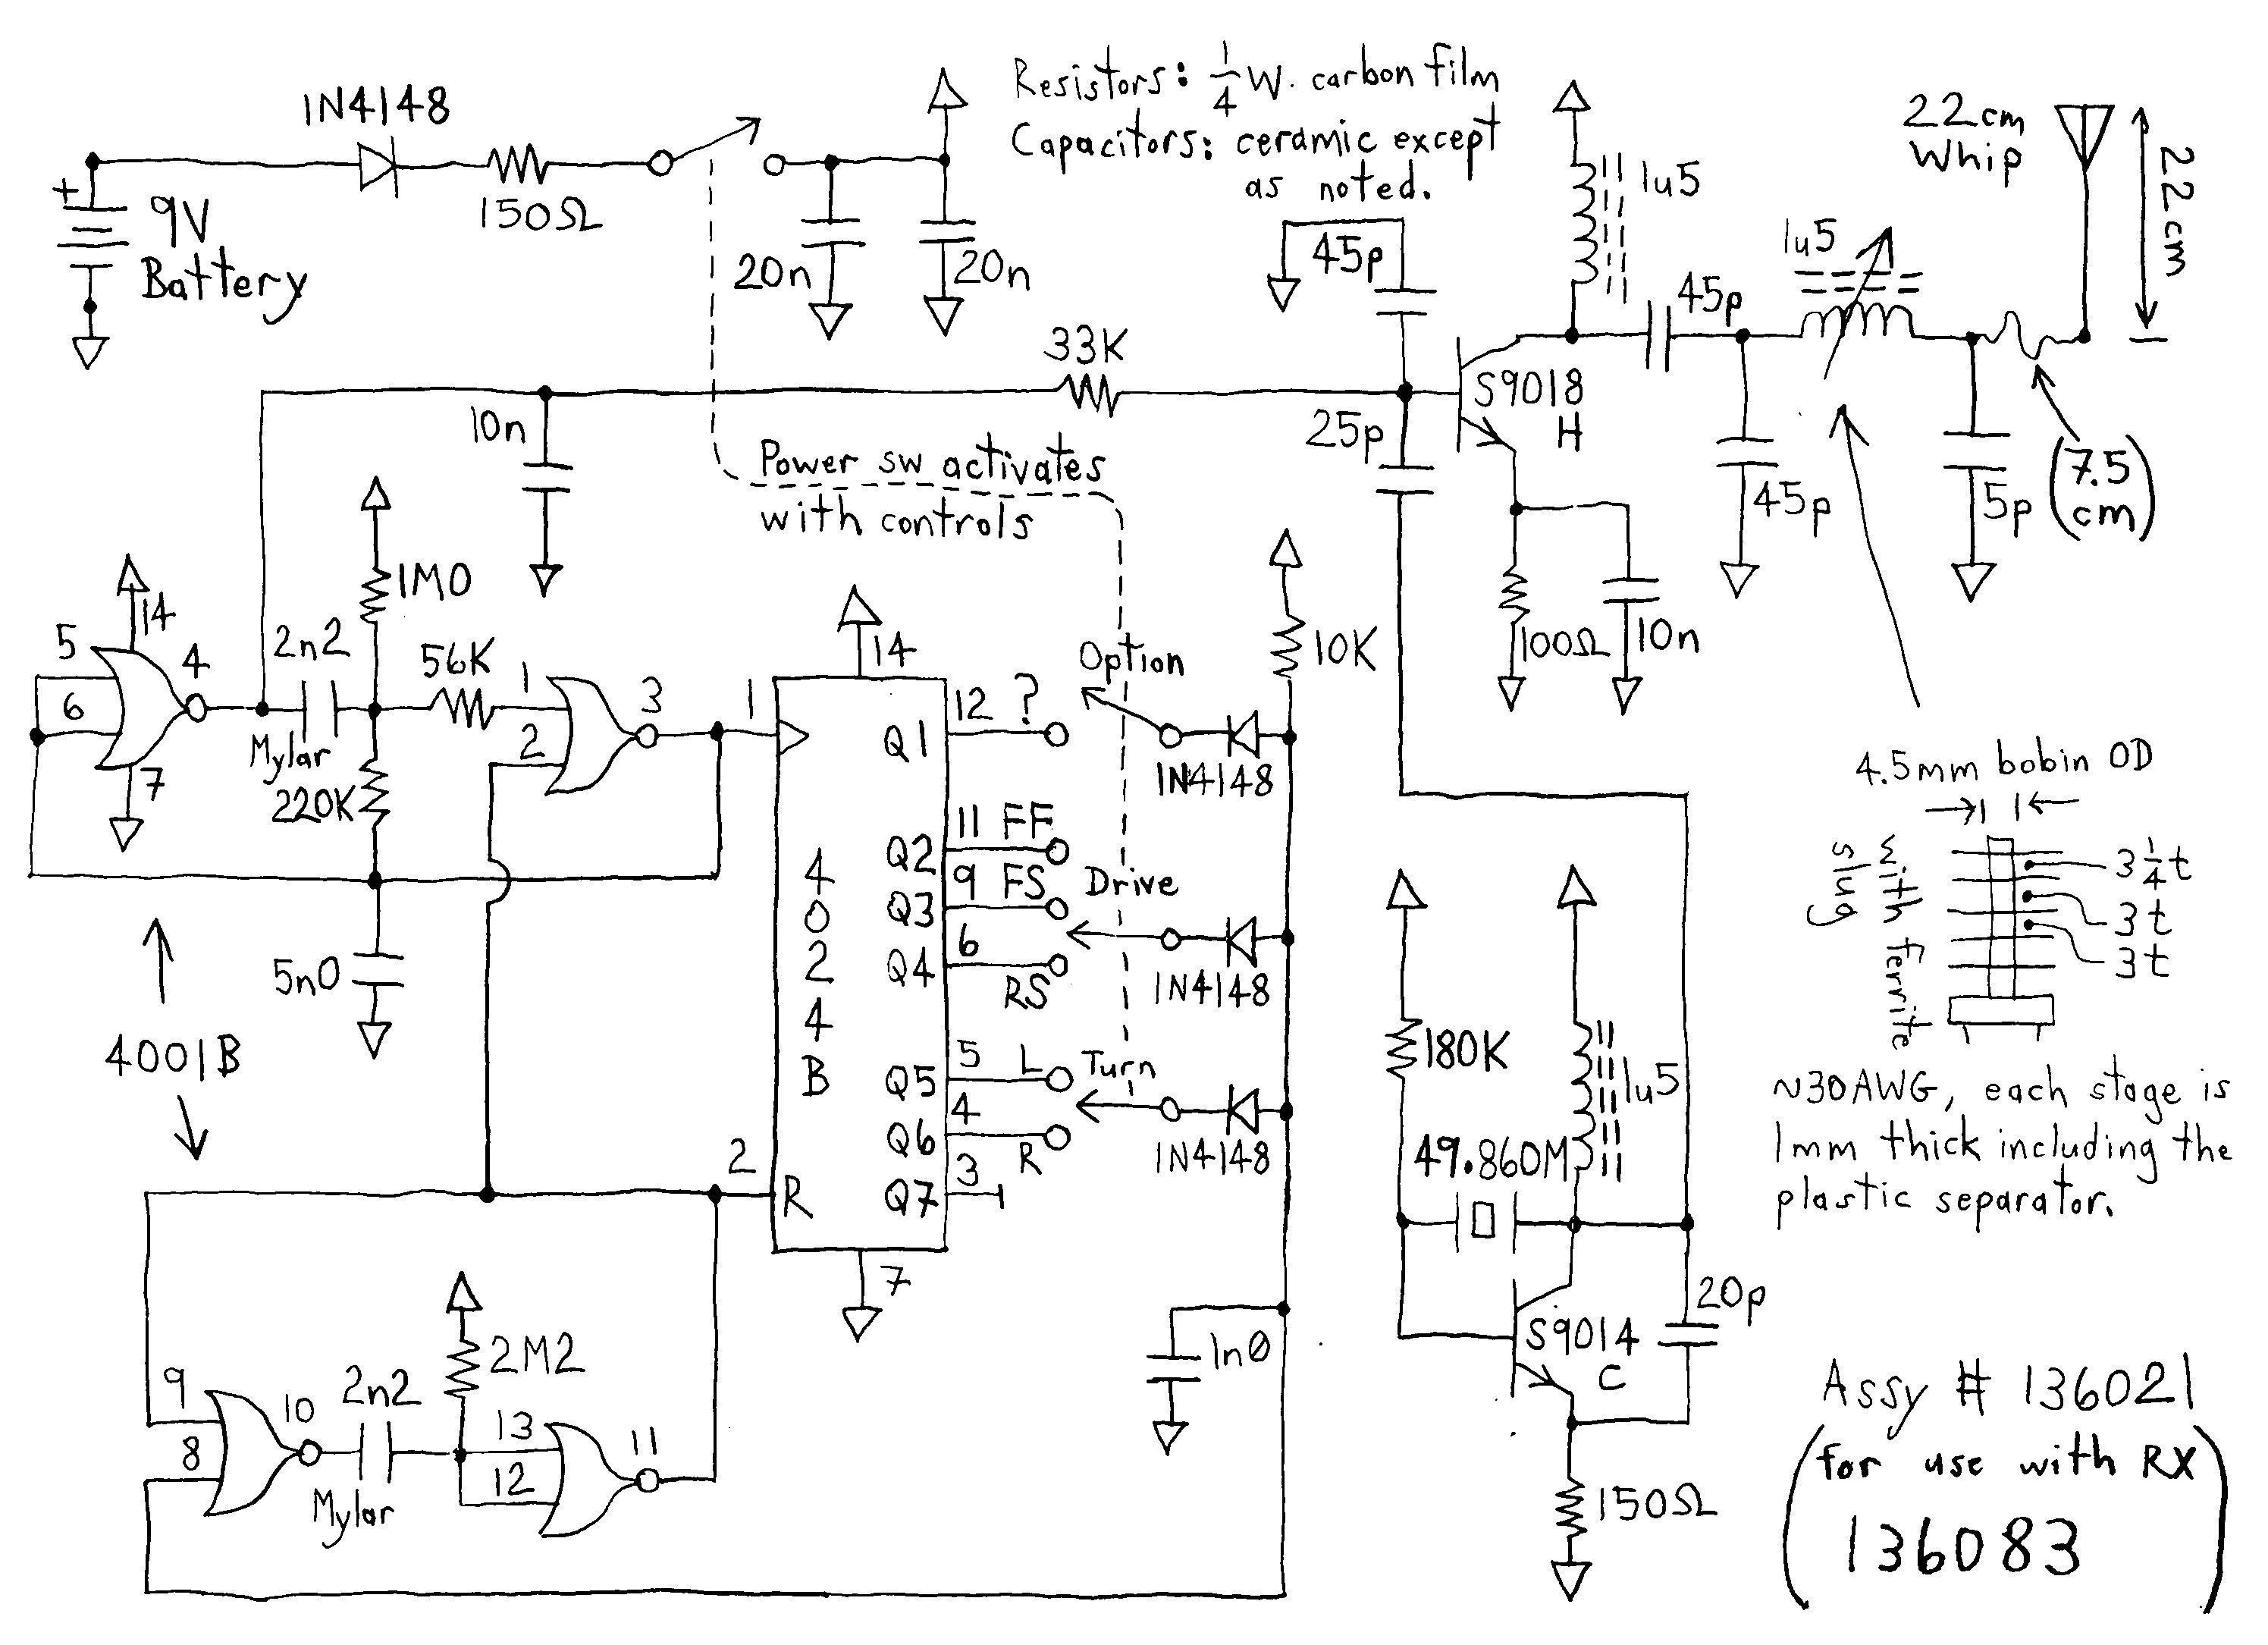 2003 Lexus Es300 Engine Diagram In 2020 Electrical Wiring Diagram Electrical Diagram Diagram Design